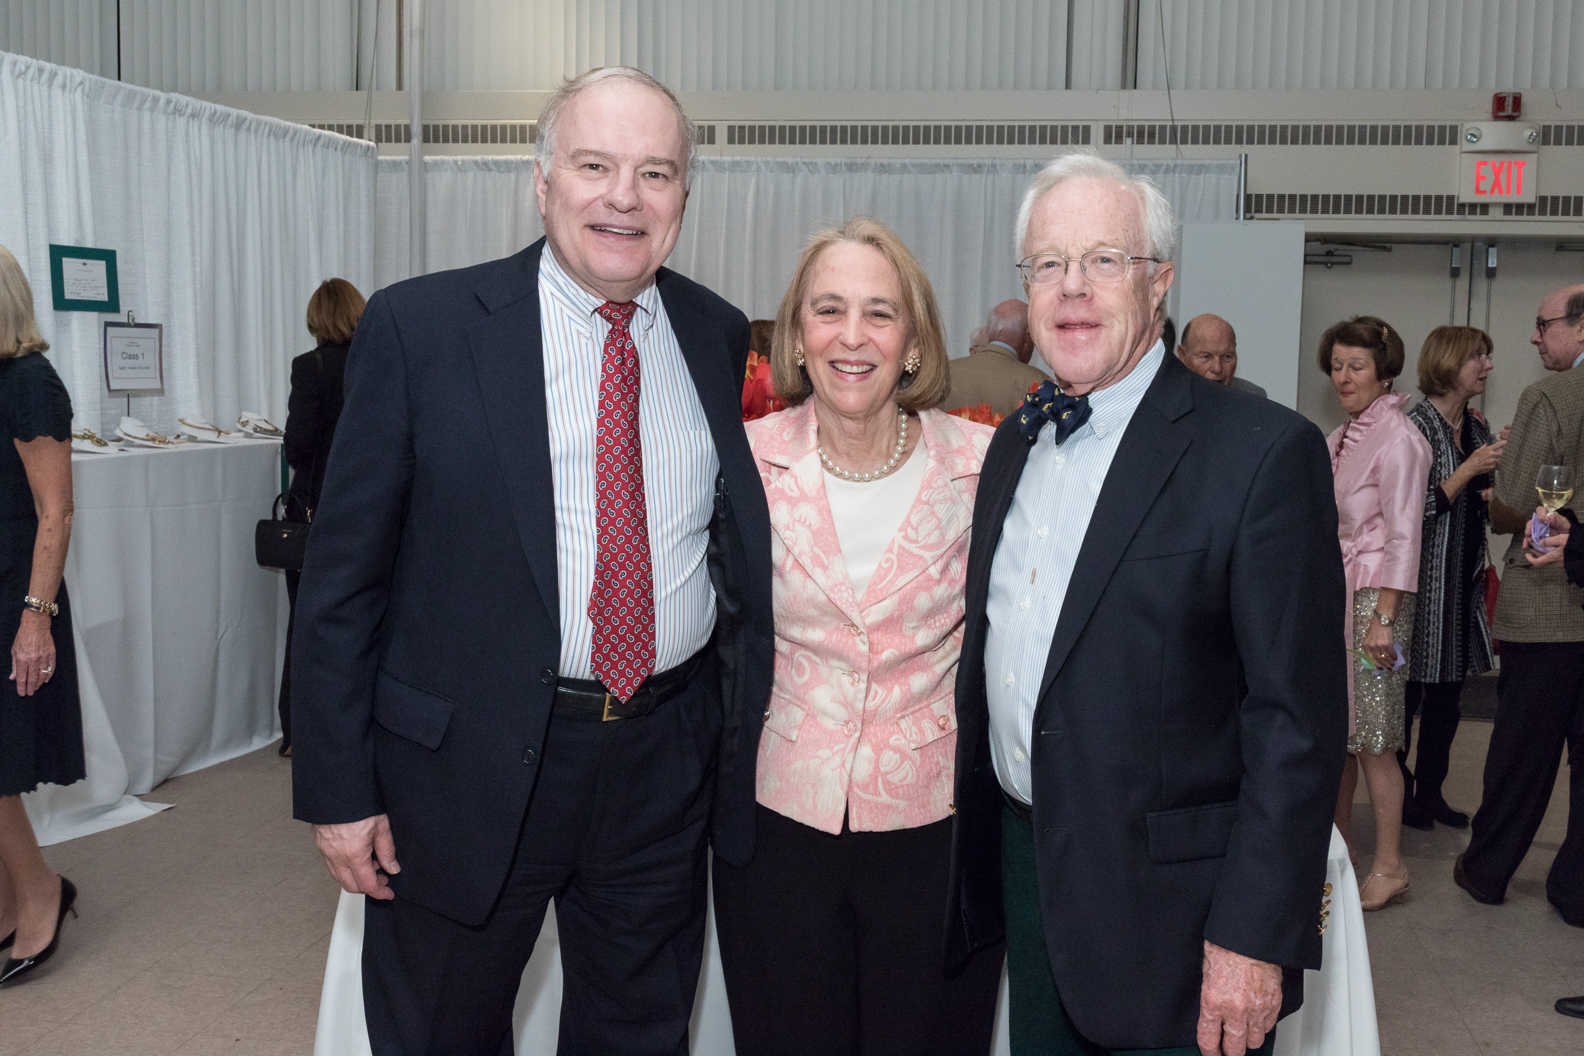 Keith Heard, Gaby Hall, John Nelson